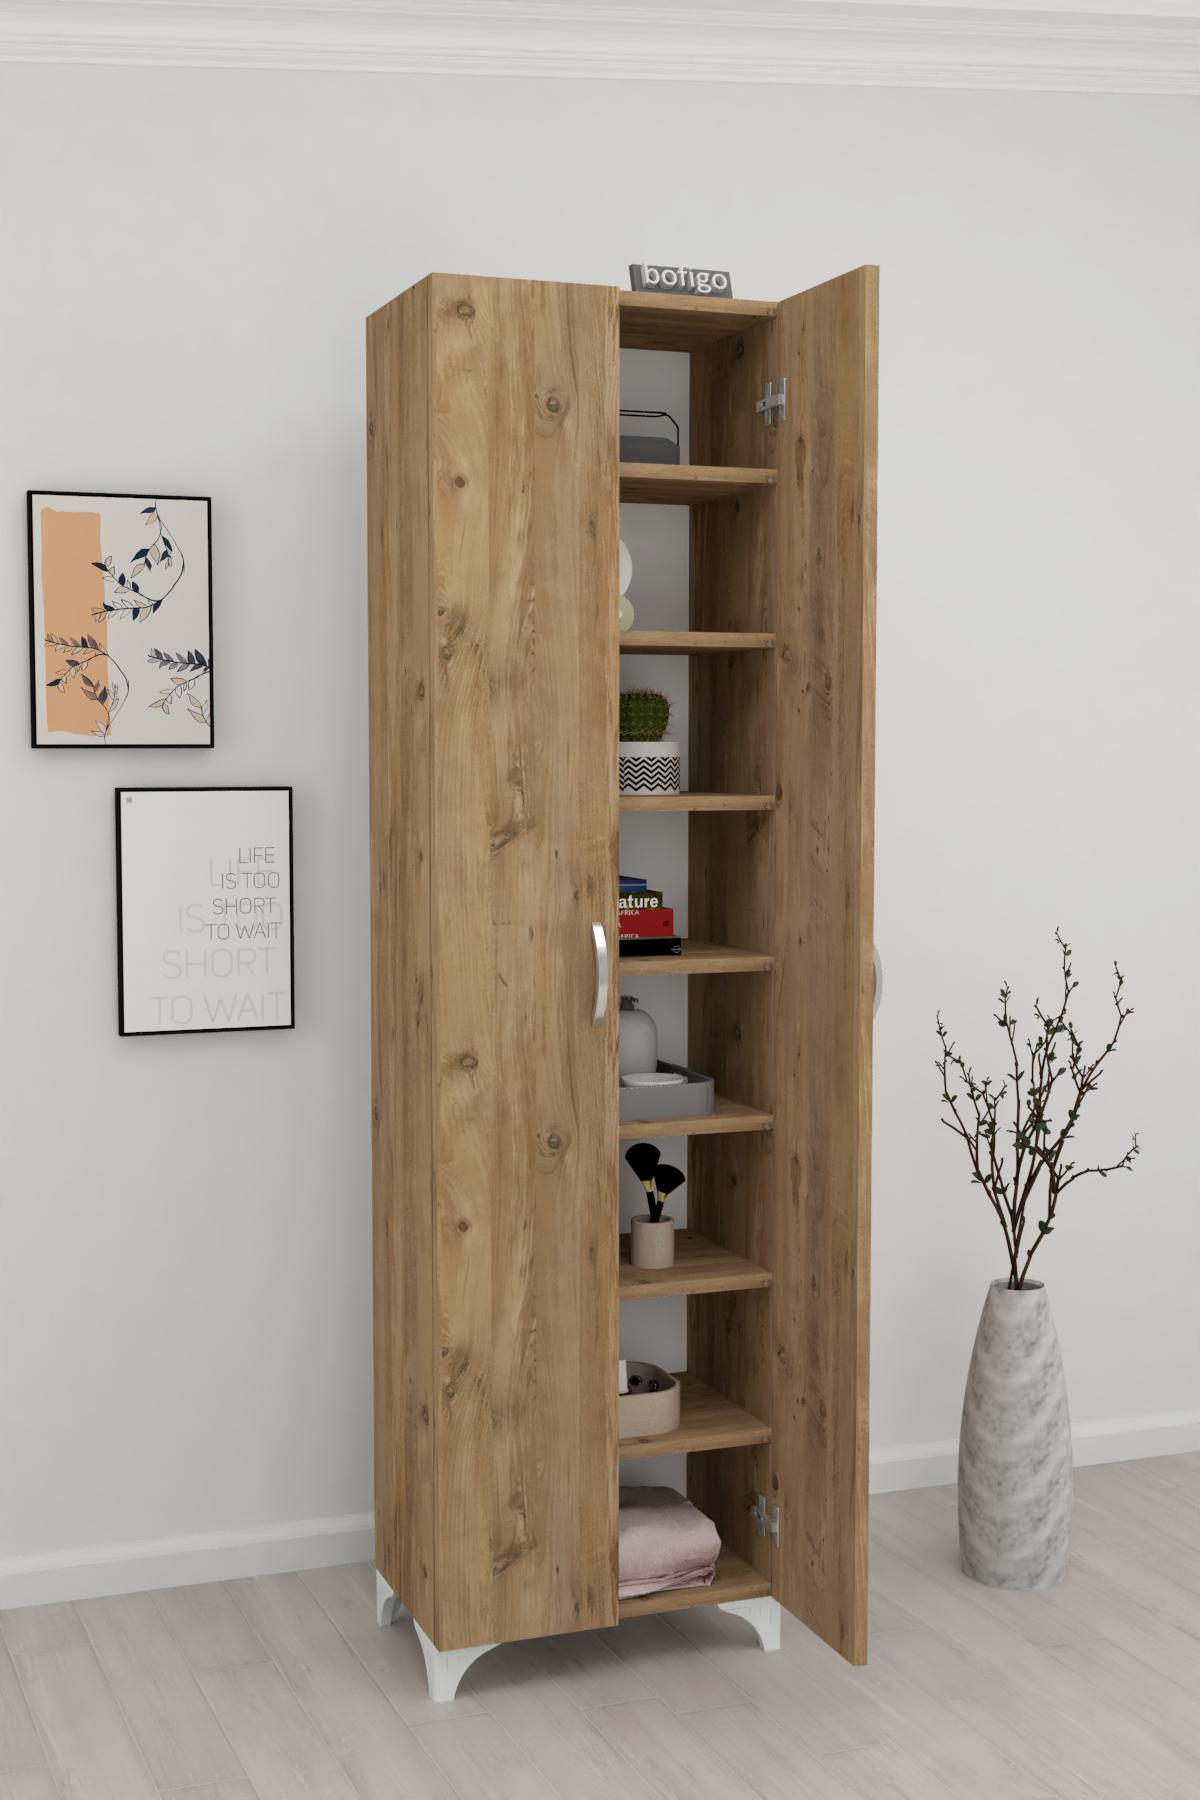 Bofigo 8 Shelves 2 Doors Multi-Purpose Cabinet Pine